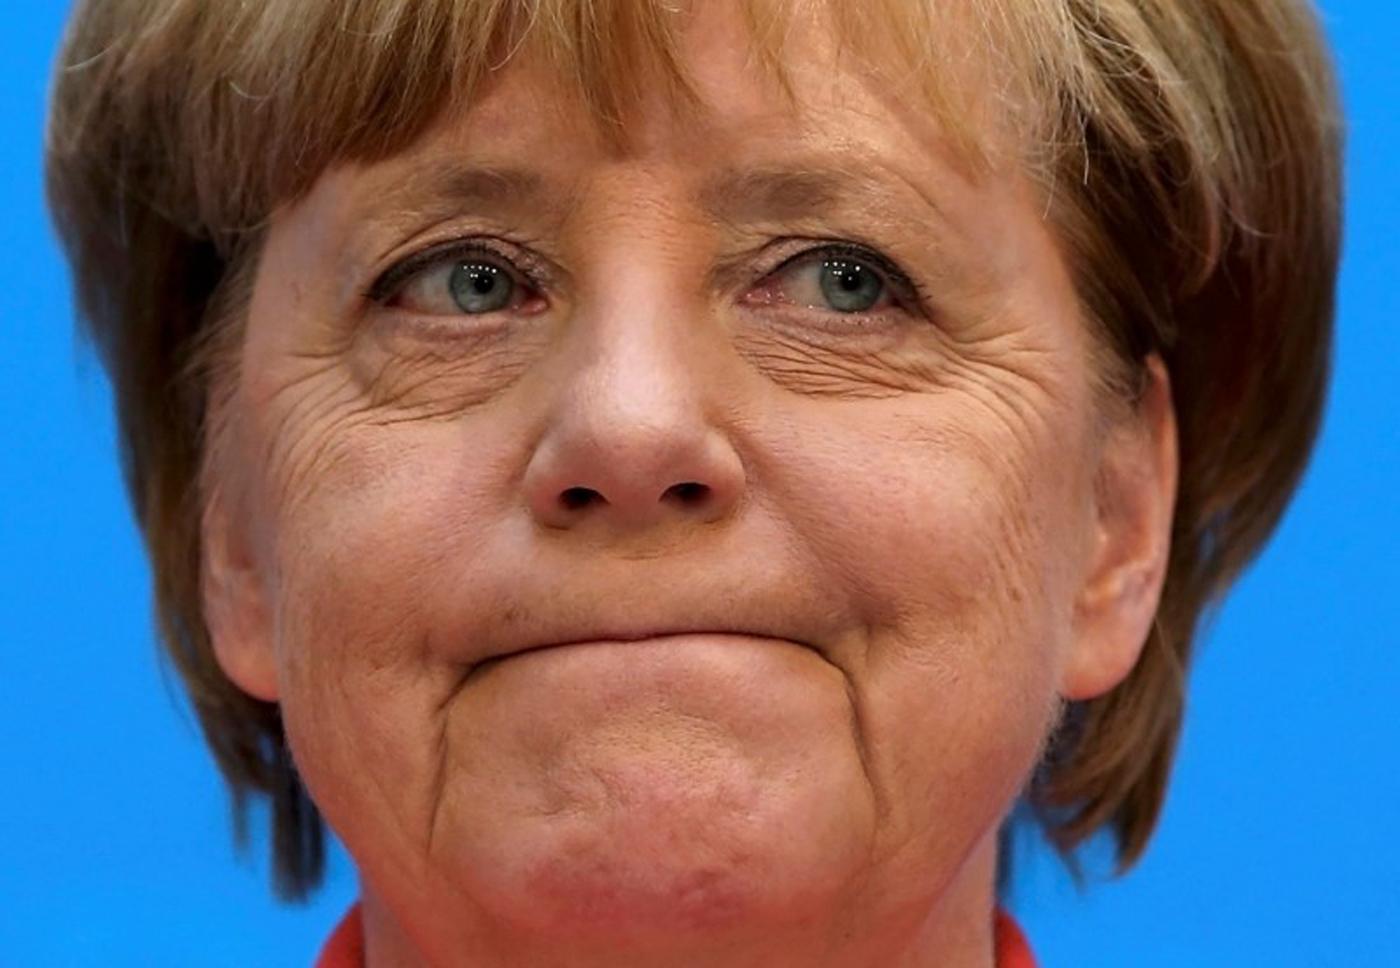 Foto: Reuters / FABRIZIO BENSCH